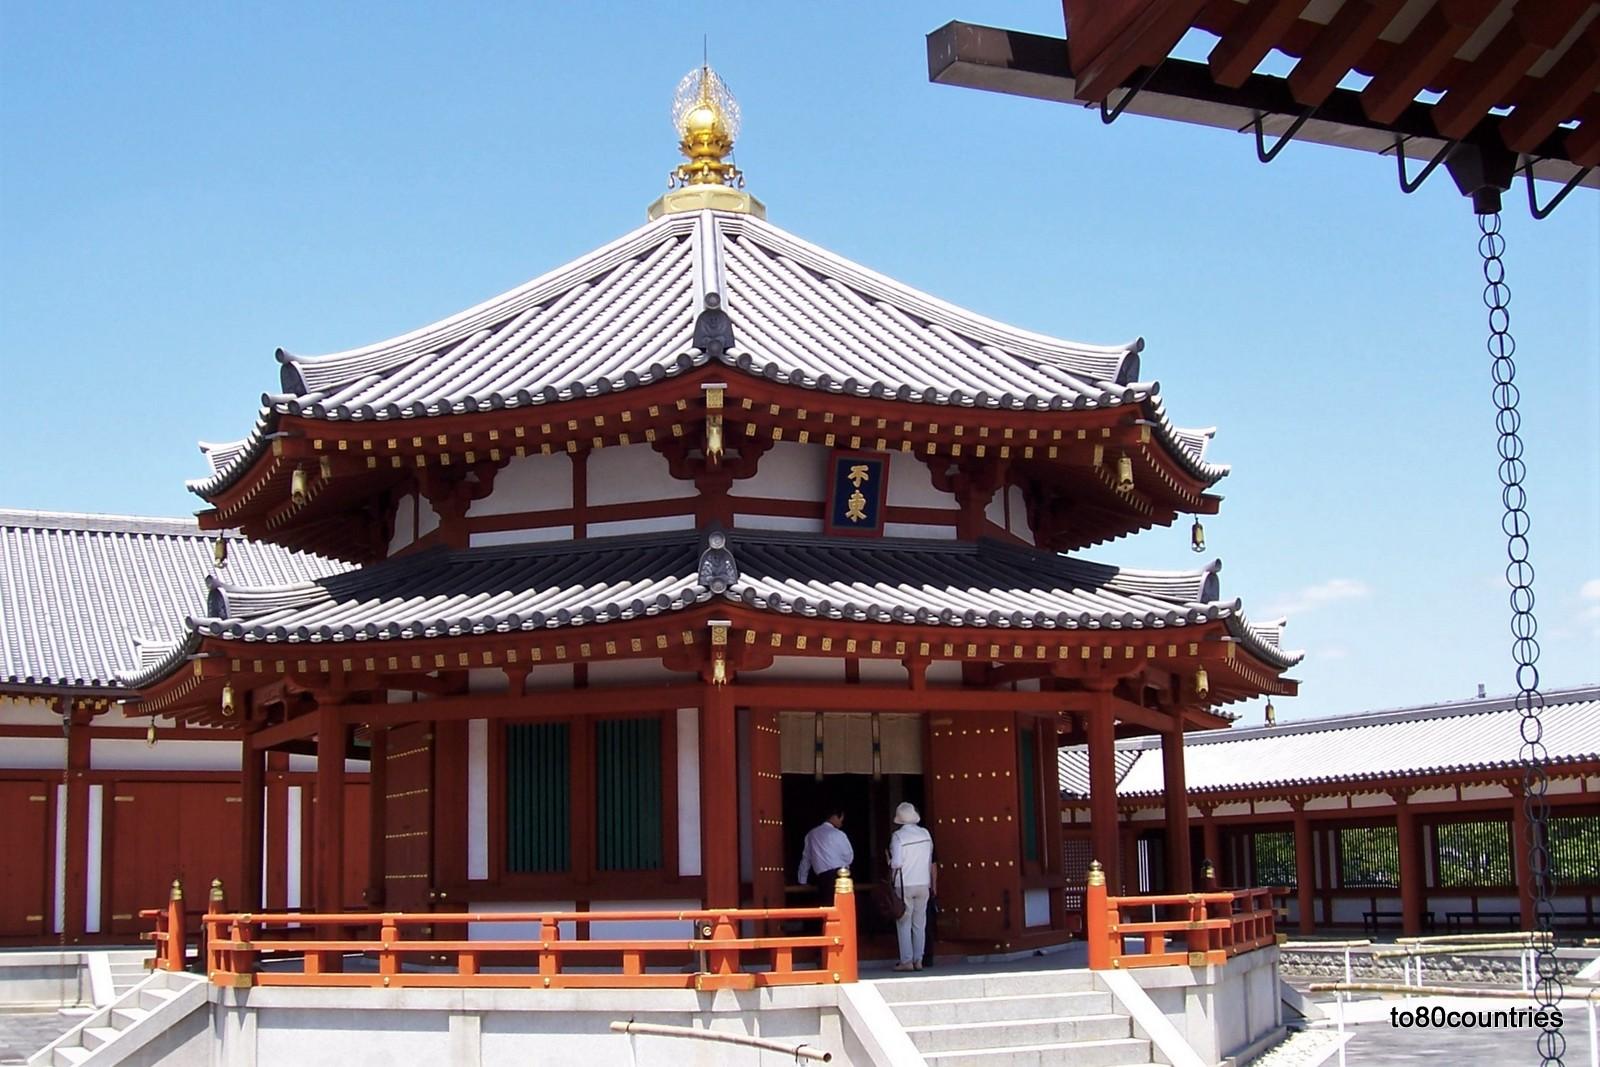 Genji-Sanzoin Halle - Nishinokyo - Japan